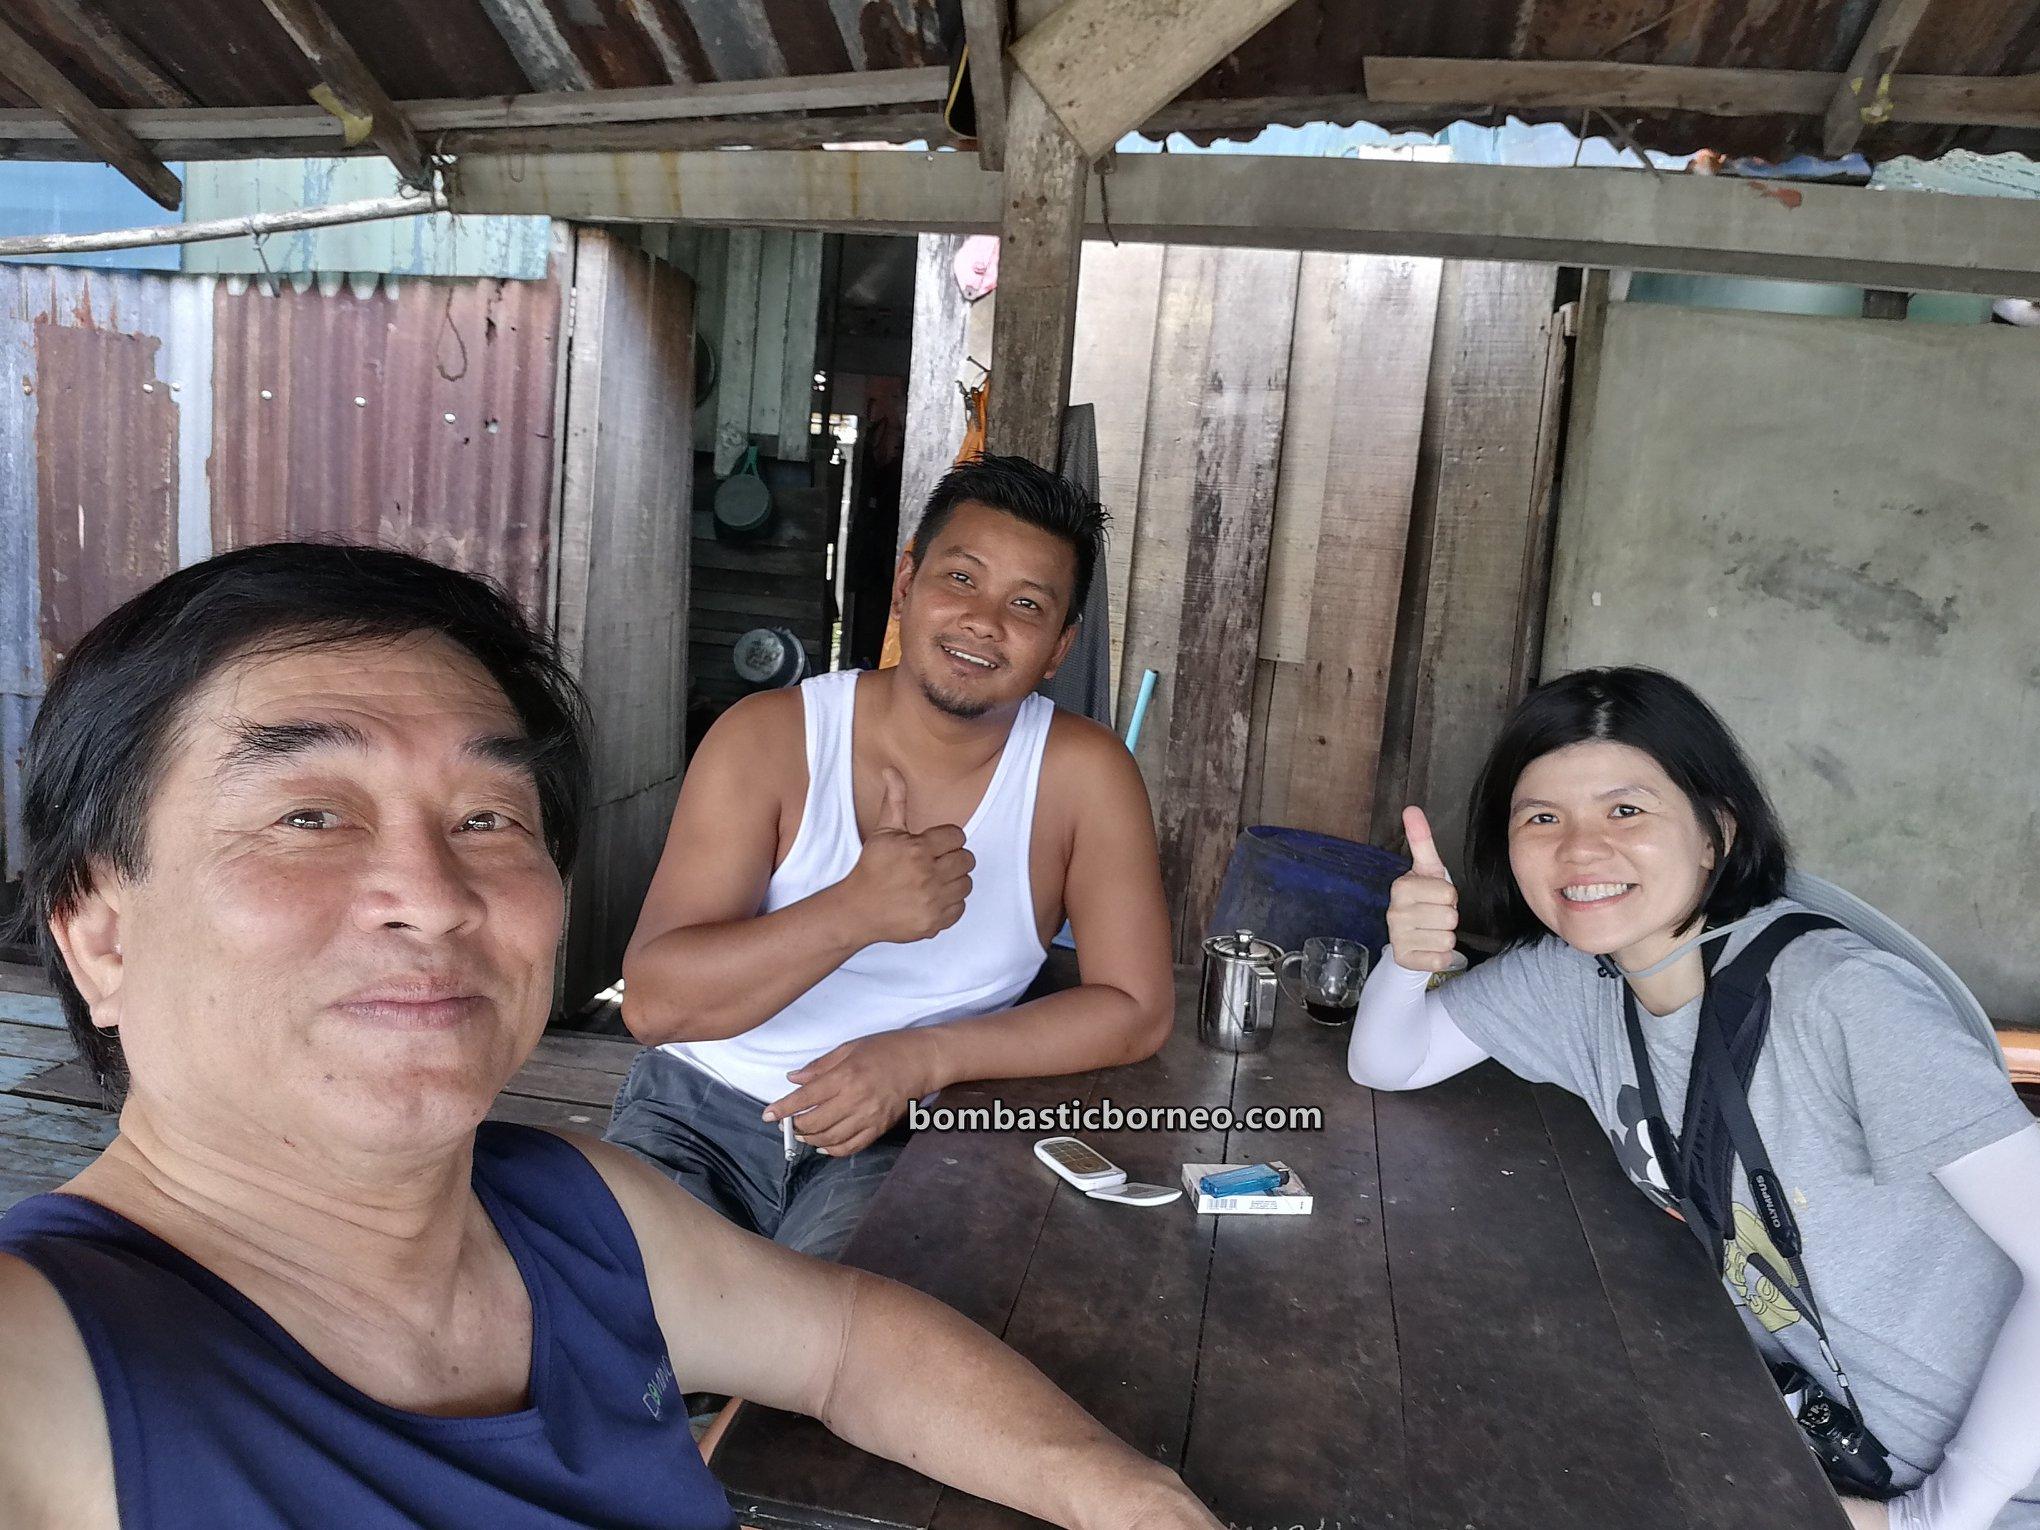 Malay Fishing Village, tradisional, authentic, traditional, Kalimantan Barat, Kelurahan Kuala, Tourism, Trans Border, 跨境婆罗洲游踪, 印尼西加里曼丹, 山口洋马来渔村